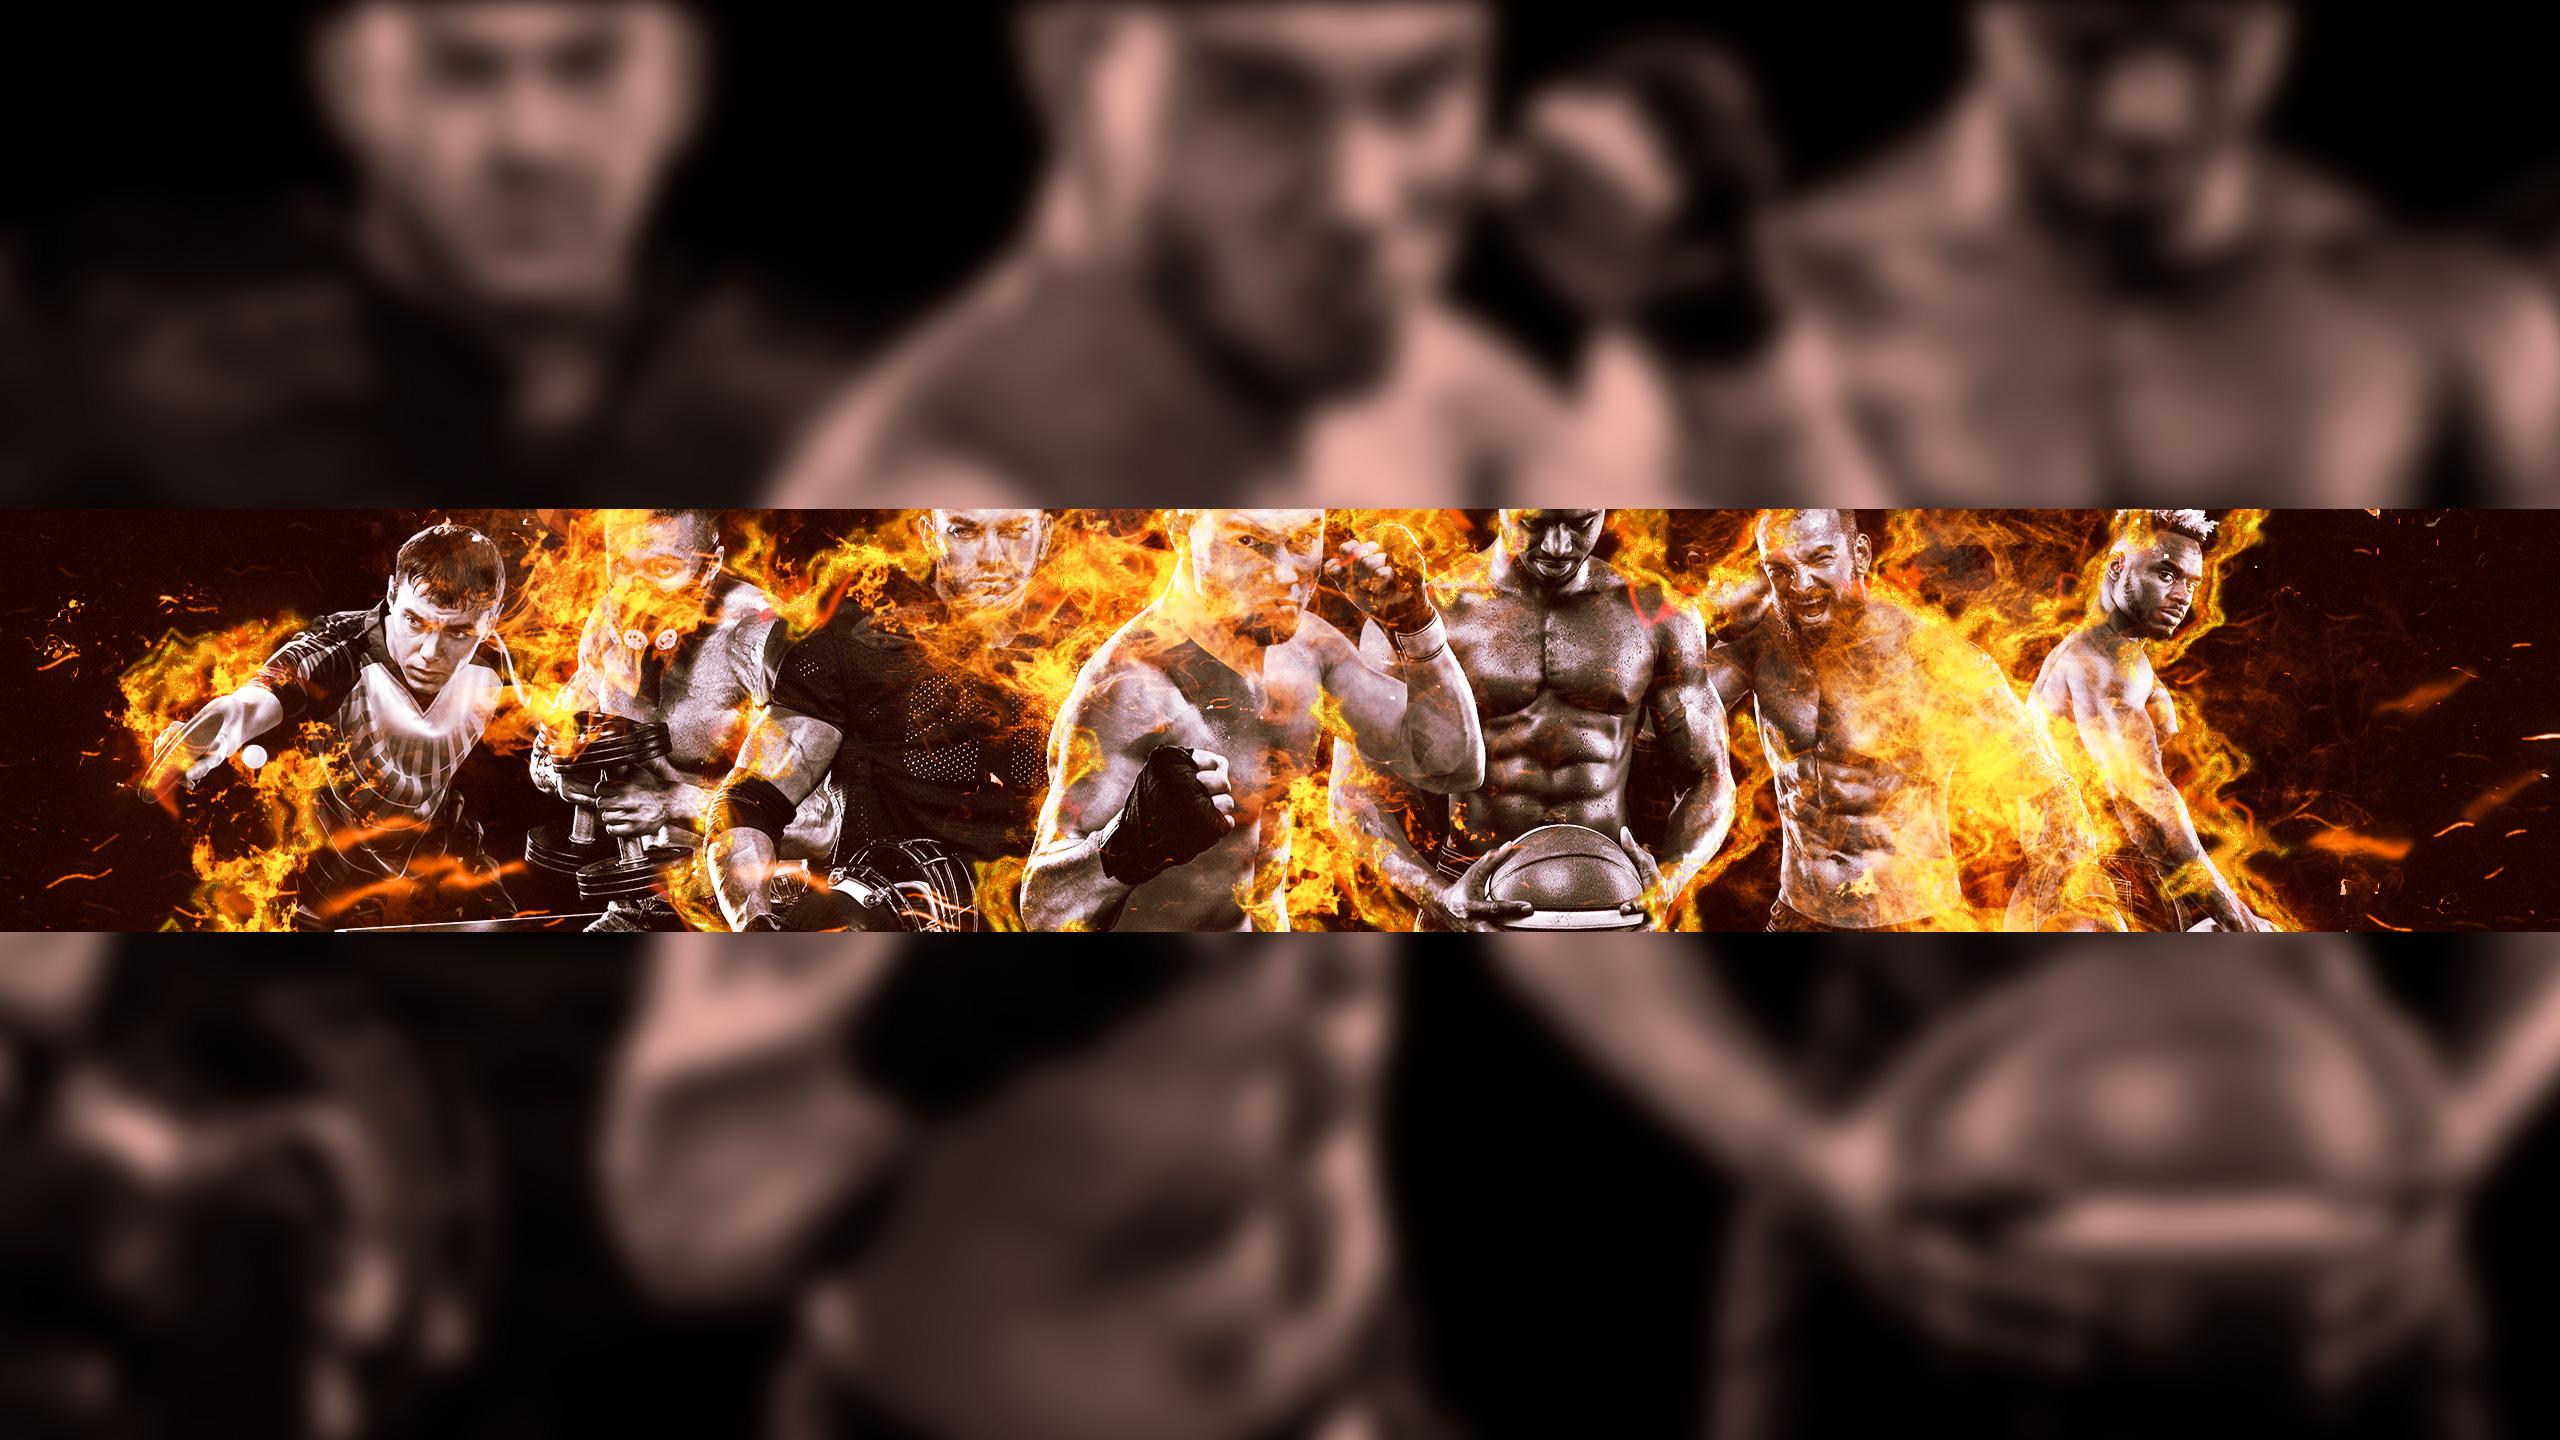 Картинка на фон для ютуба с бойцами спортивных единоборств на фоне пламени.